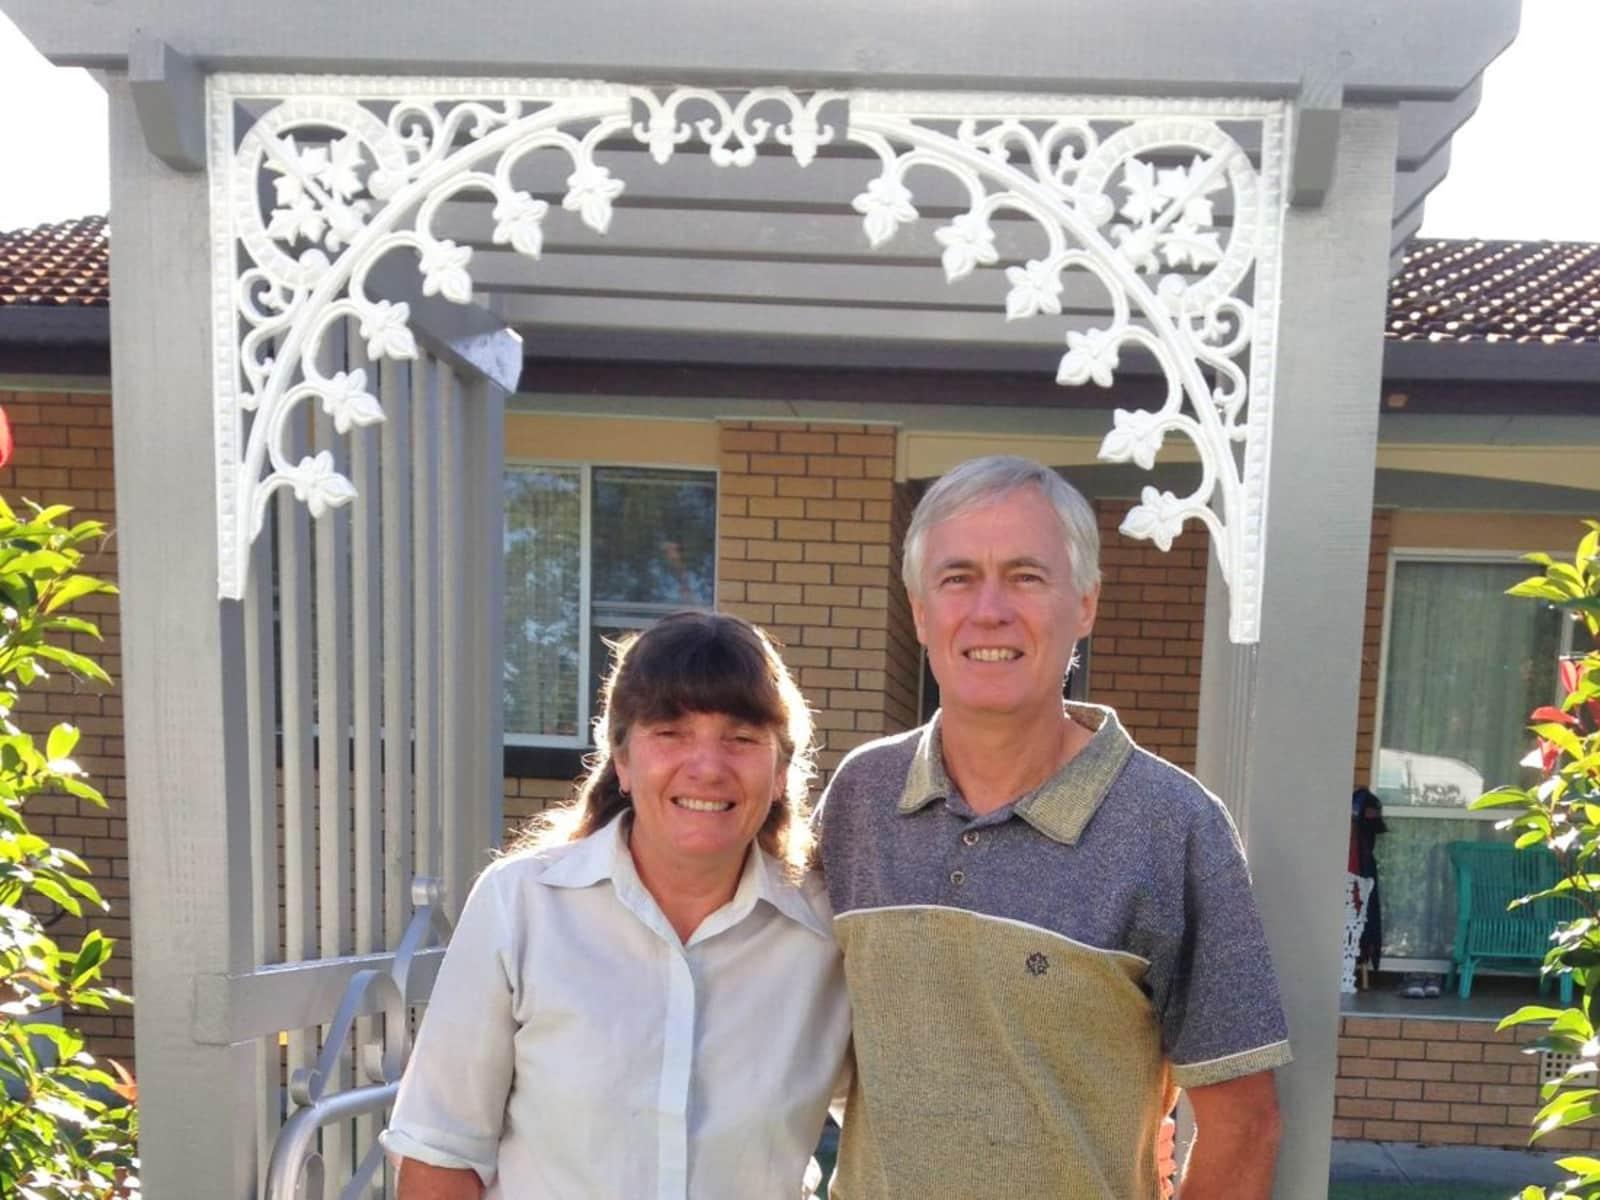 Graeme & Lynette from Townsville, Queensland, Australia